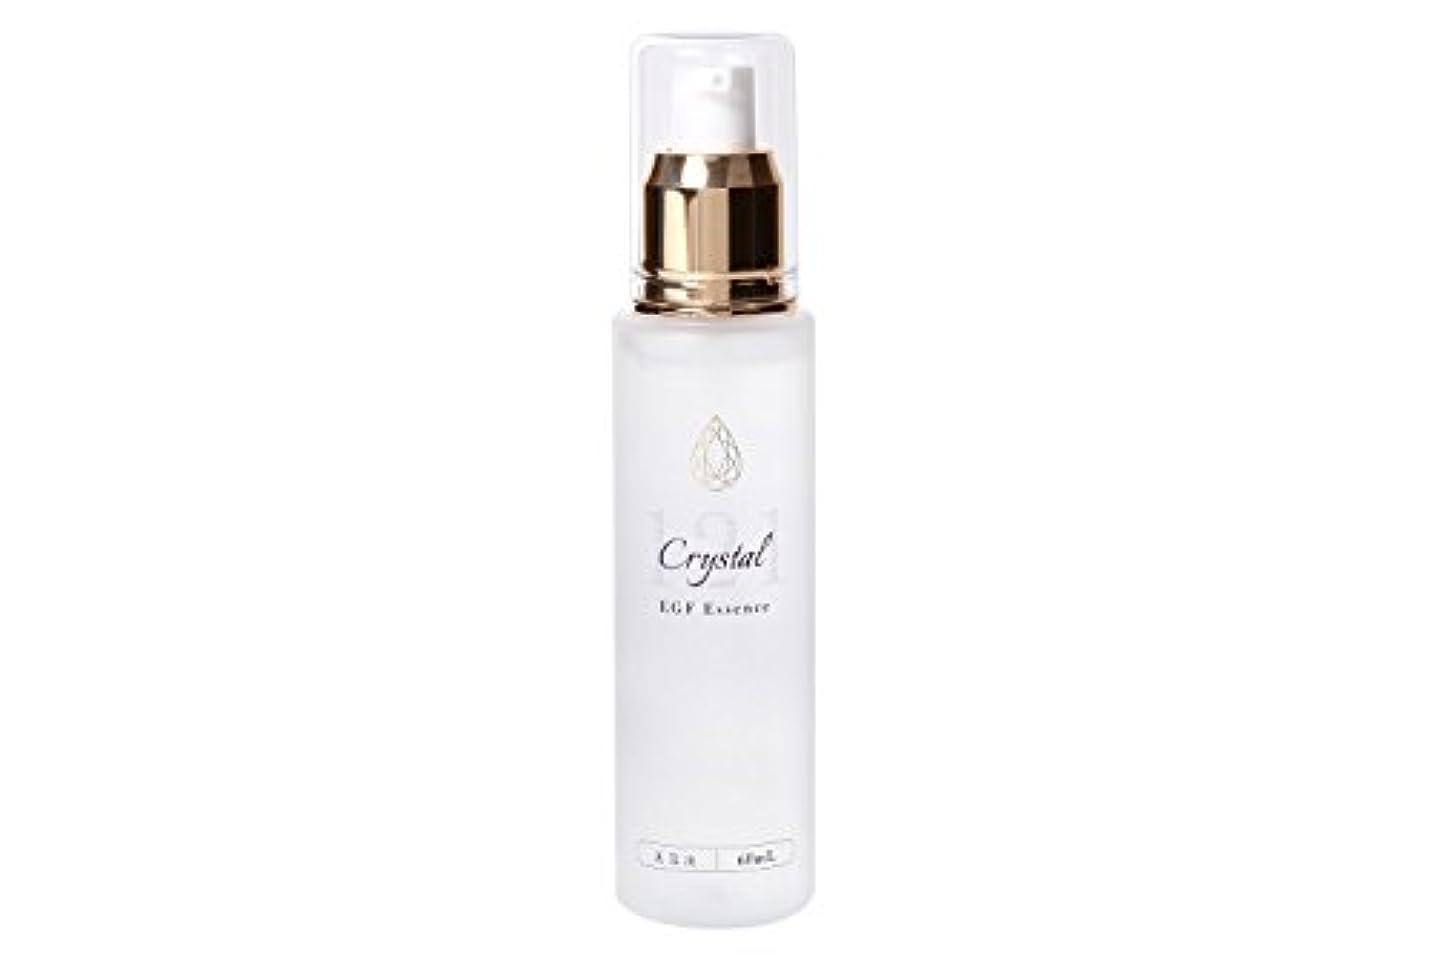 EGF 美容液 エッセンス 60ml クリスタル121美容液 レディース メンズ 無香料